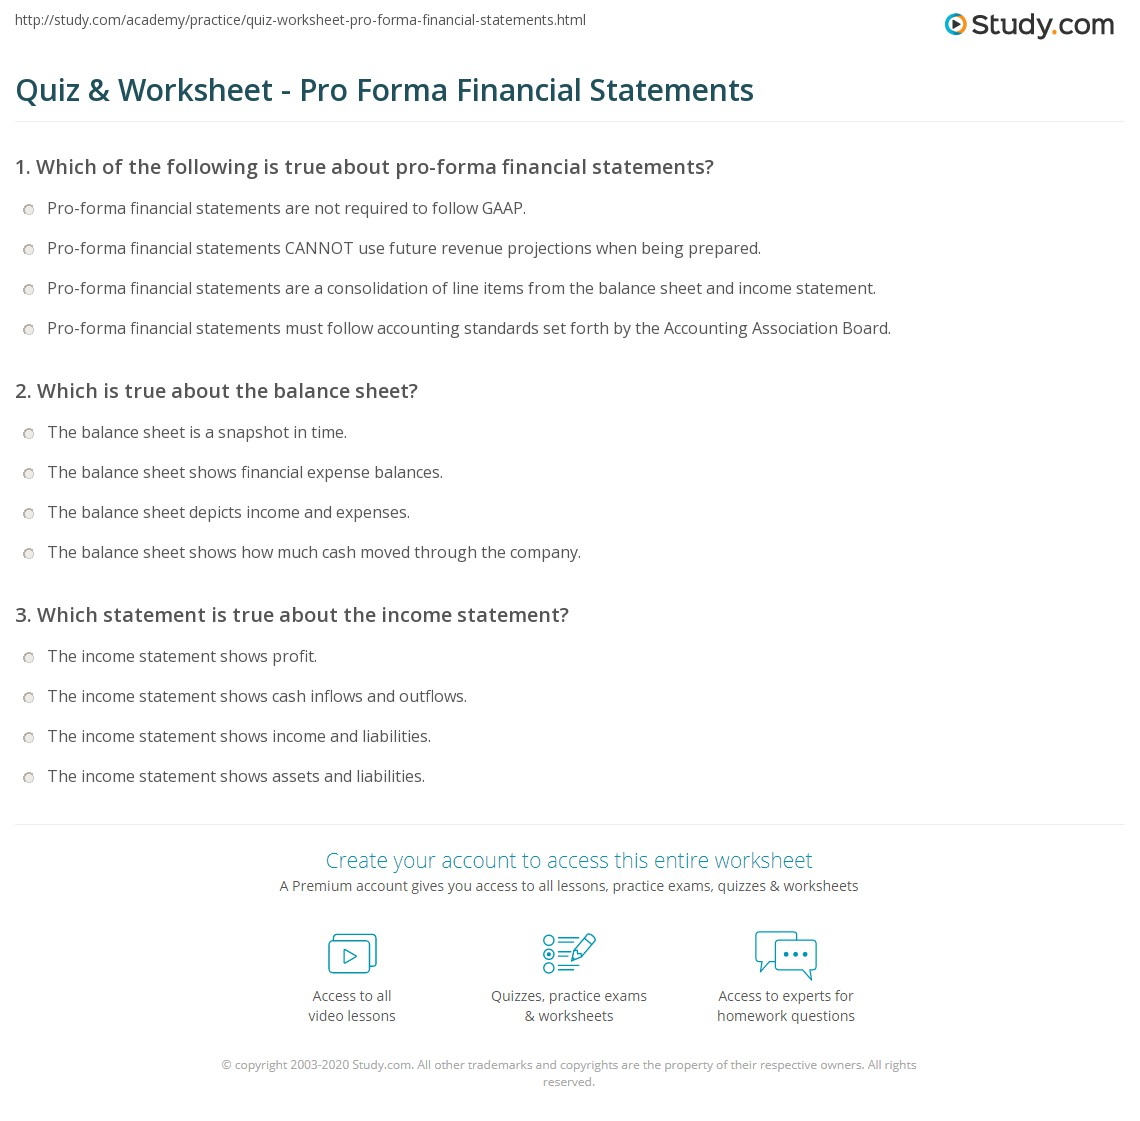 Printables Pro Forma Worksheet quiz worksheet pro forma financial statements study com print project cash flows worksheet